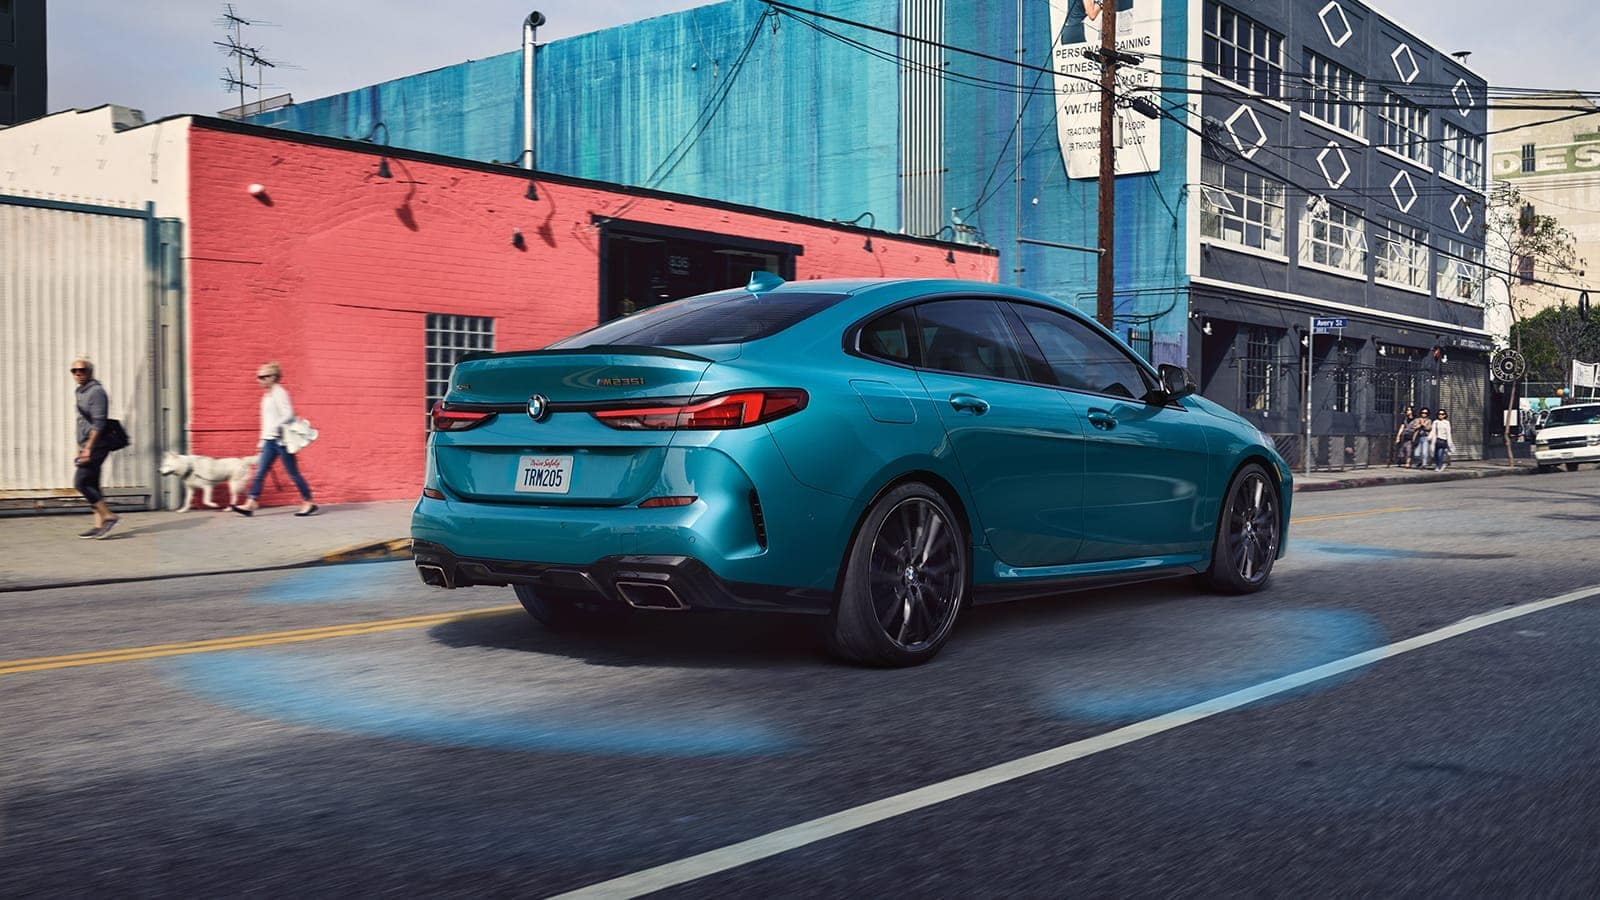 BMW 2 Series Gran Coupe in an urban backdrop.